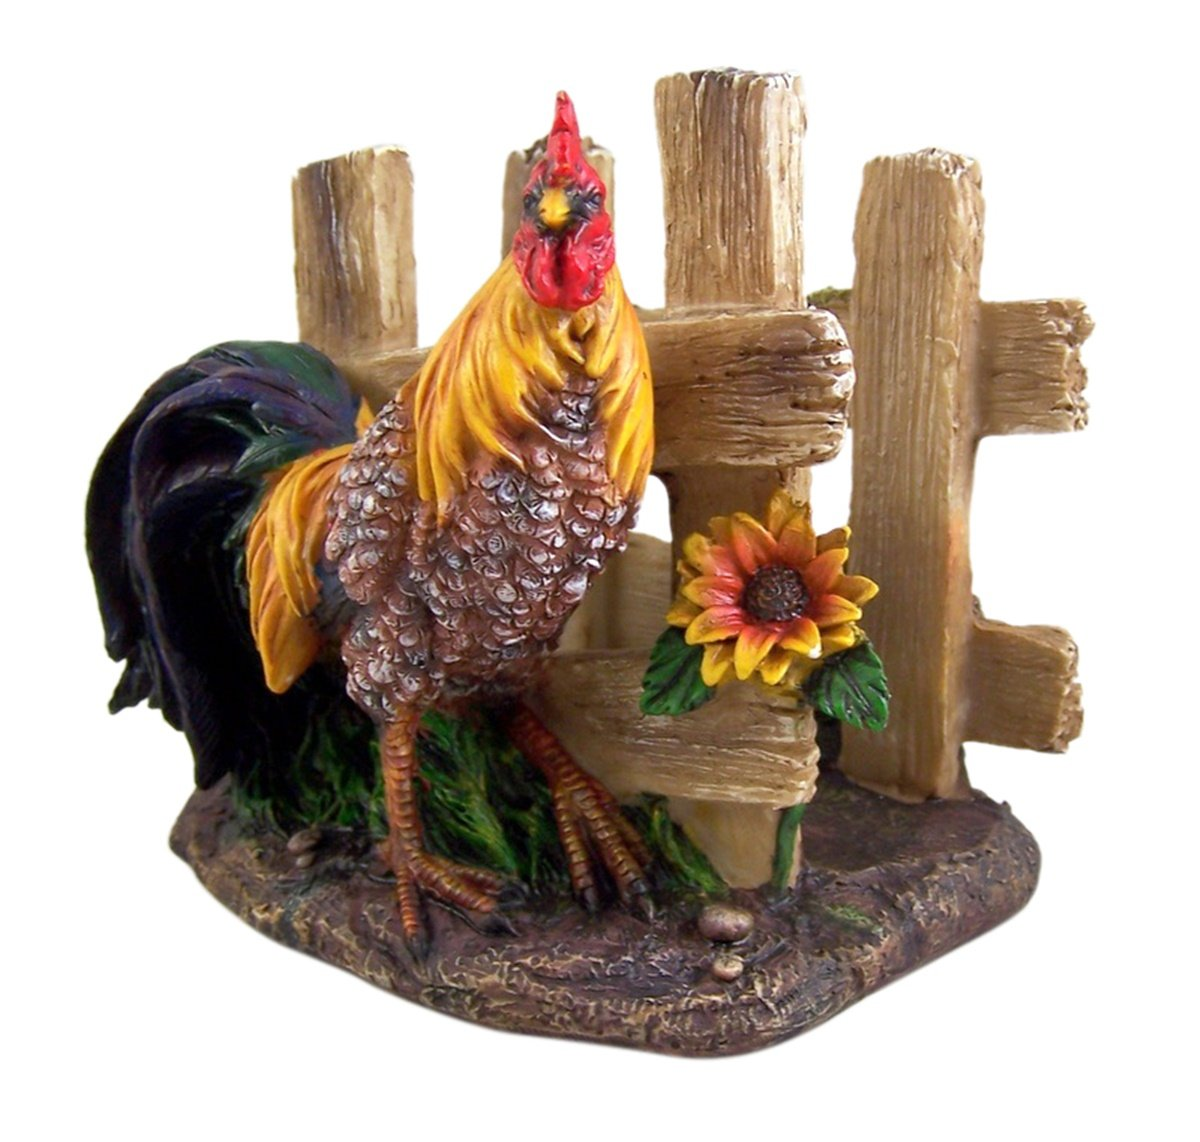 Farm Yard Rooster Napkin Holder 5 1/4 Inch